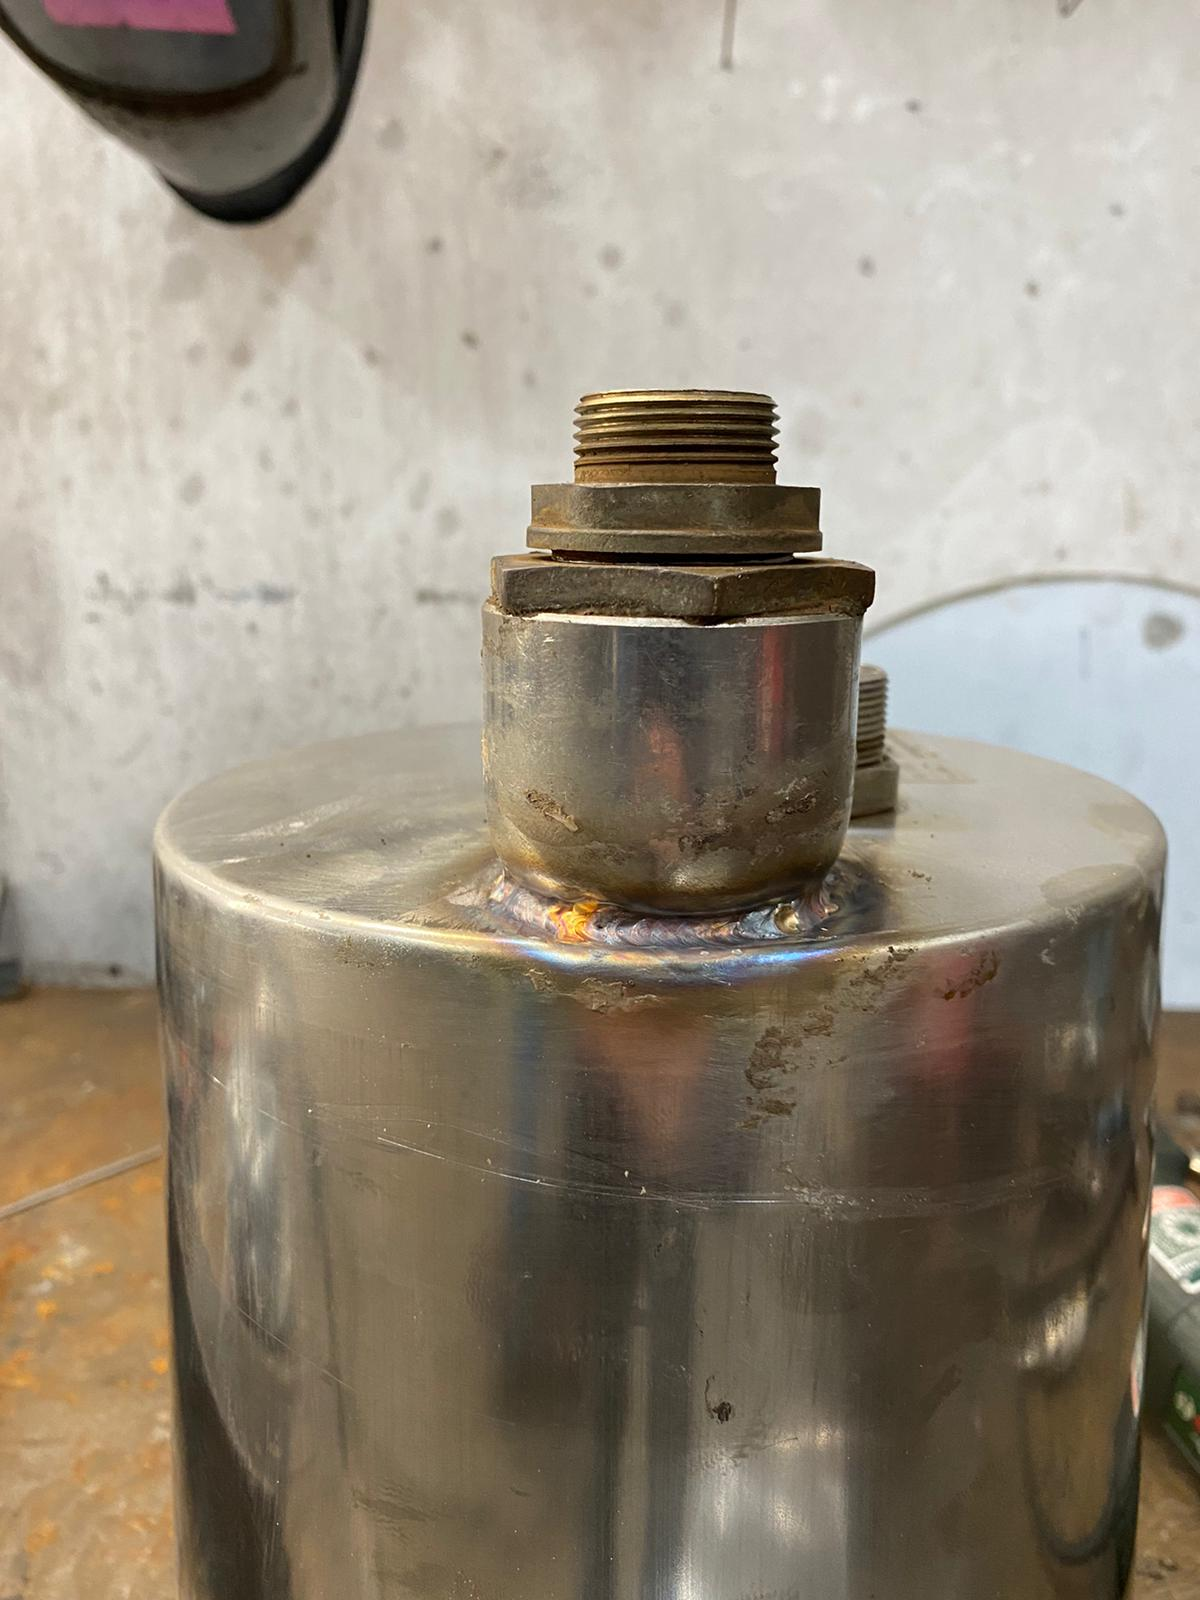 Stainless High Pressure Water Tank Repair